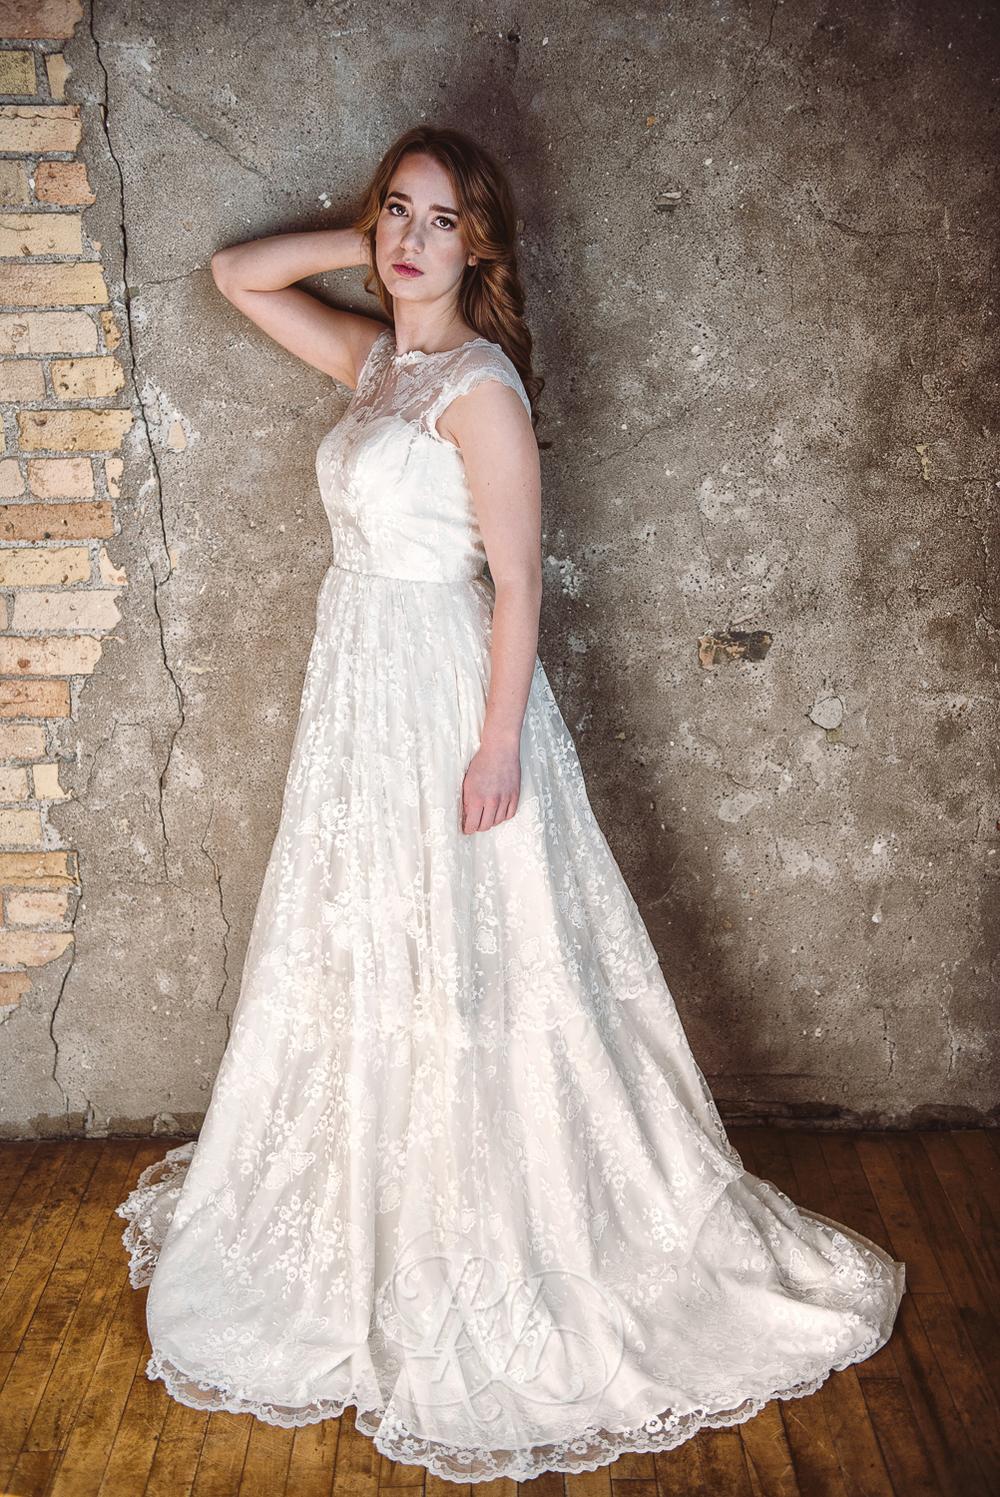 Minneapolis Wedding Shoot - RKH Images - Minnesota Wedding Photographer - Samples-29